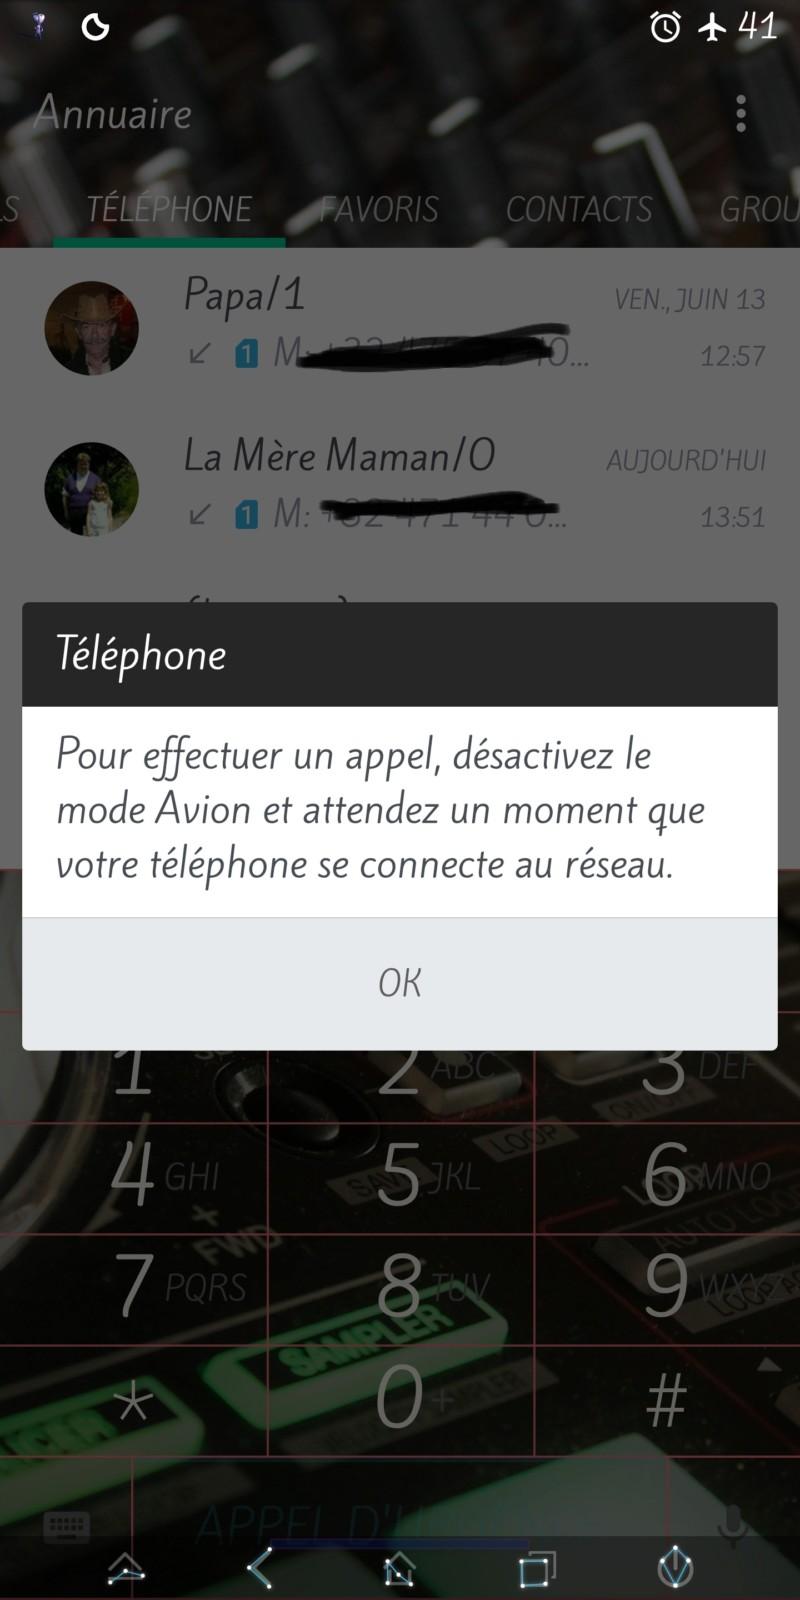 [AIDE] Bootloop interminable sur HTC U12+ - Page 3 20181213